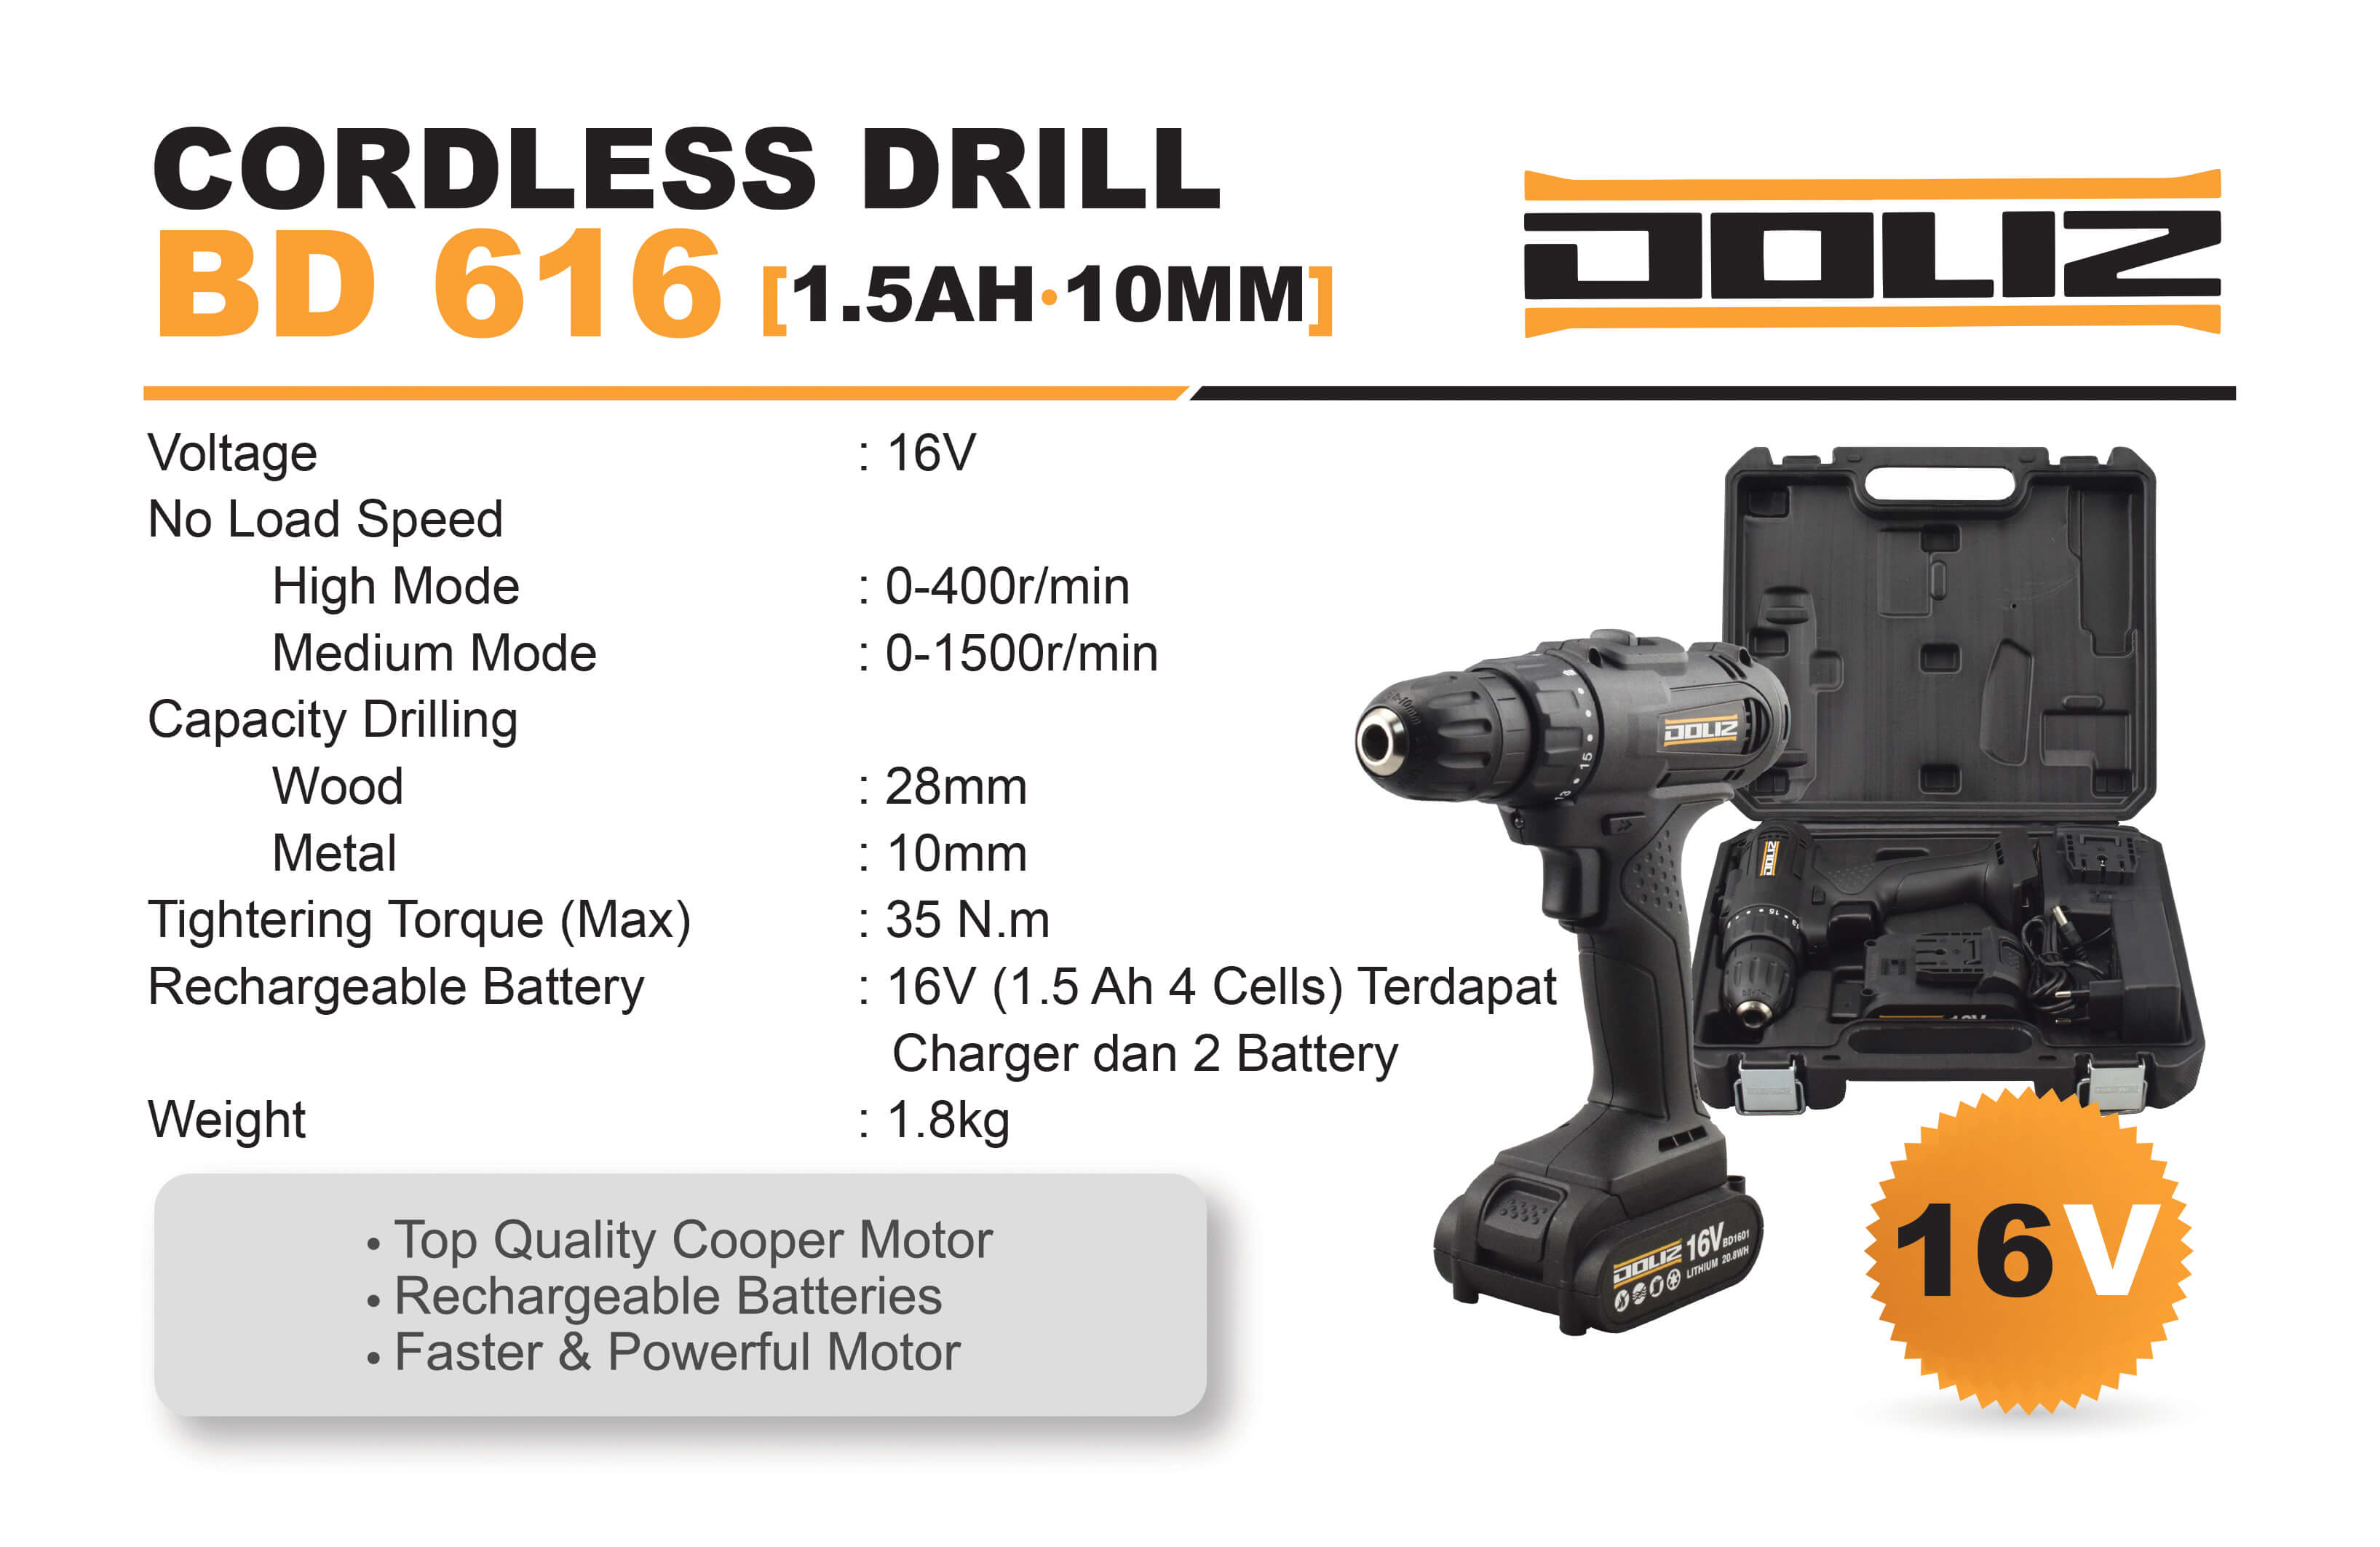 Doliz cordless drill series BD 616